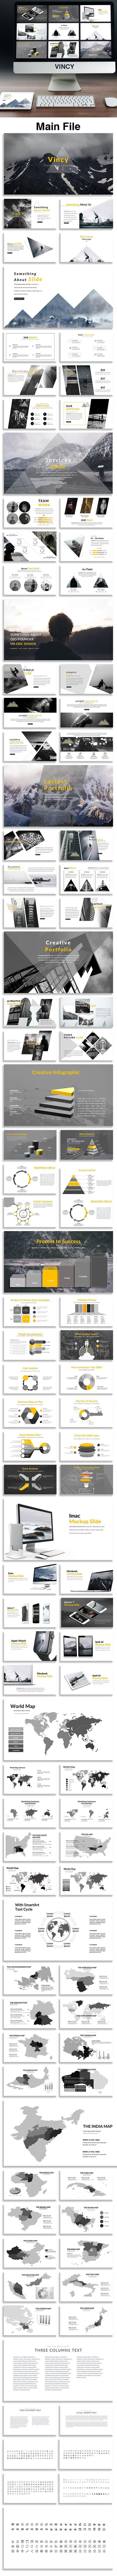 Vincy - Creative PowerPoint Template